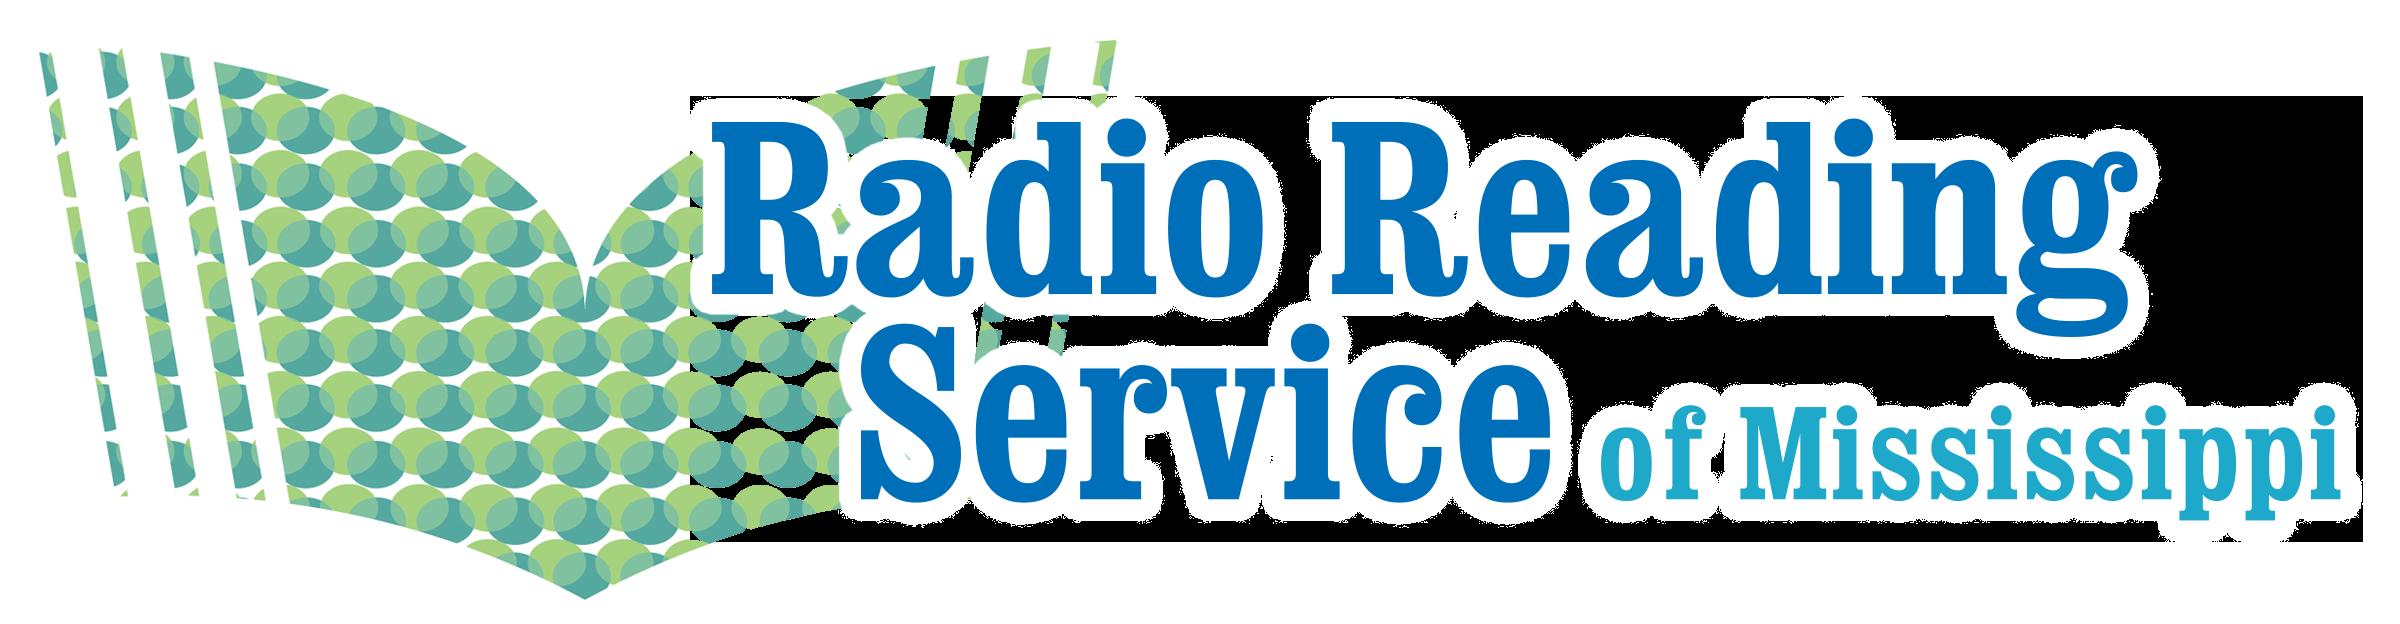 MPBRadioReading_logo.png